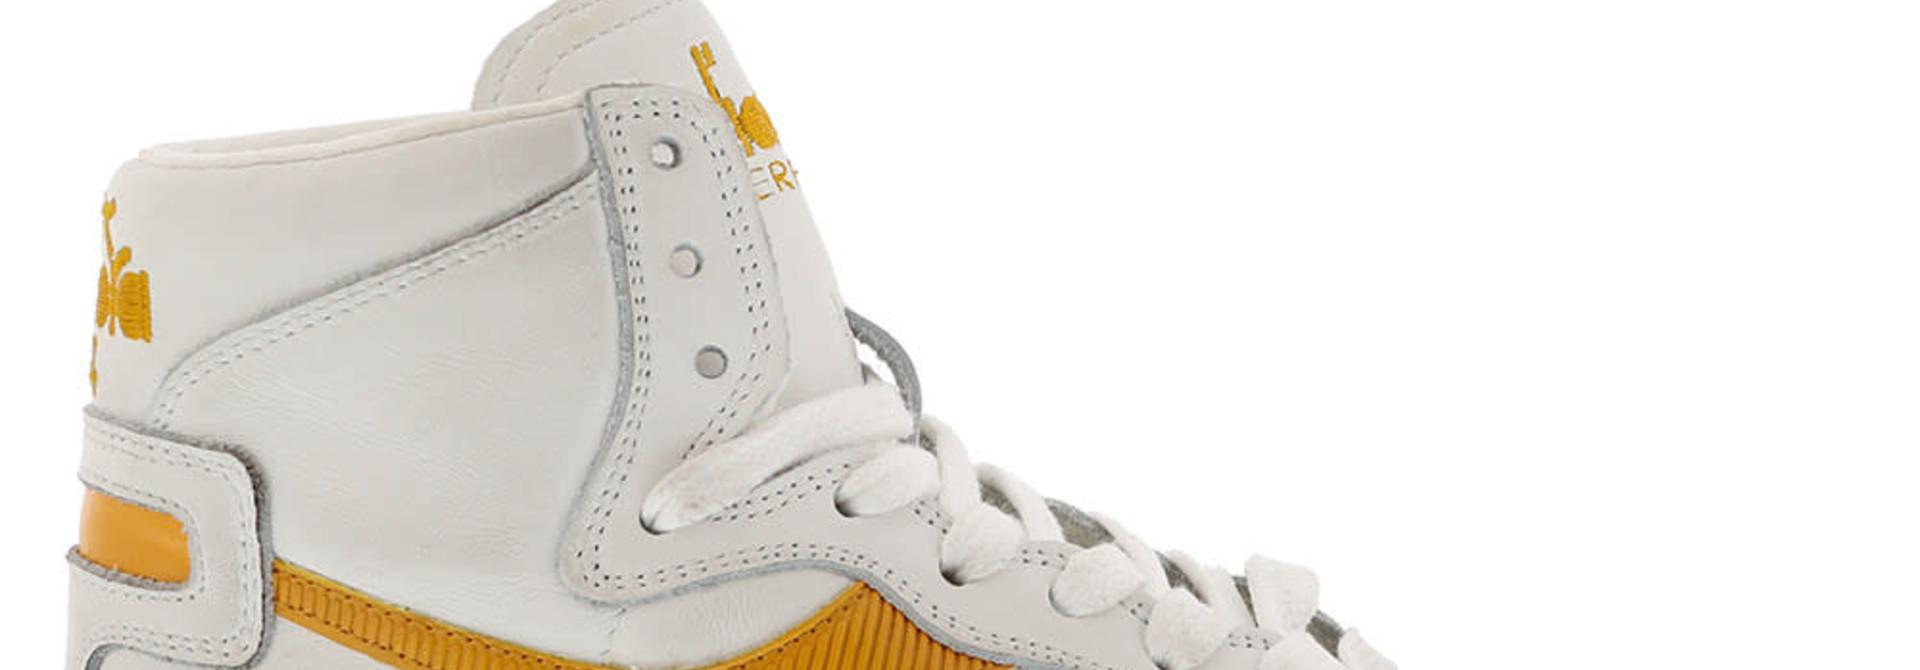 Sneaker basket yellow